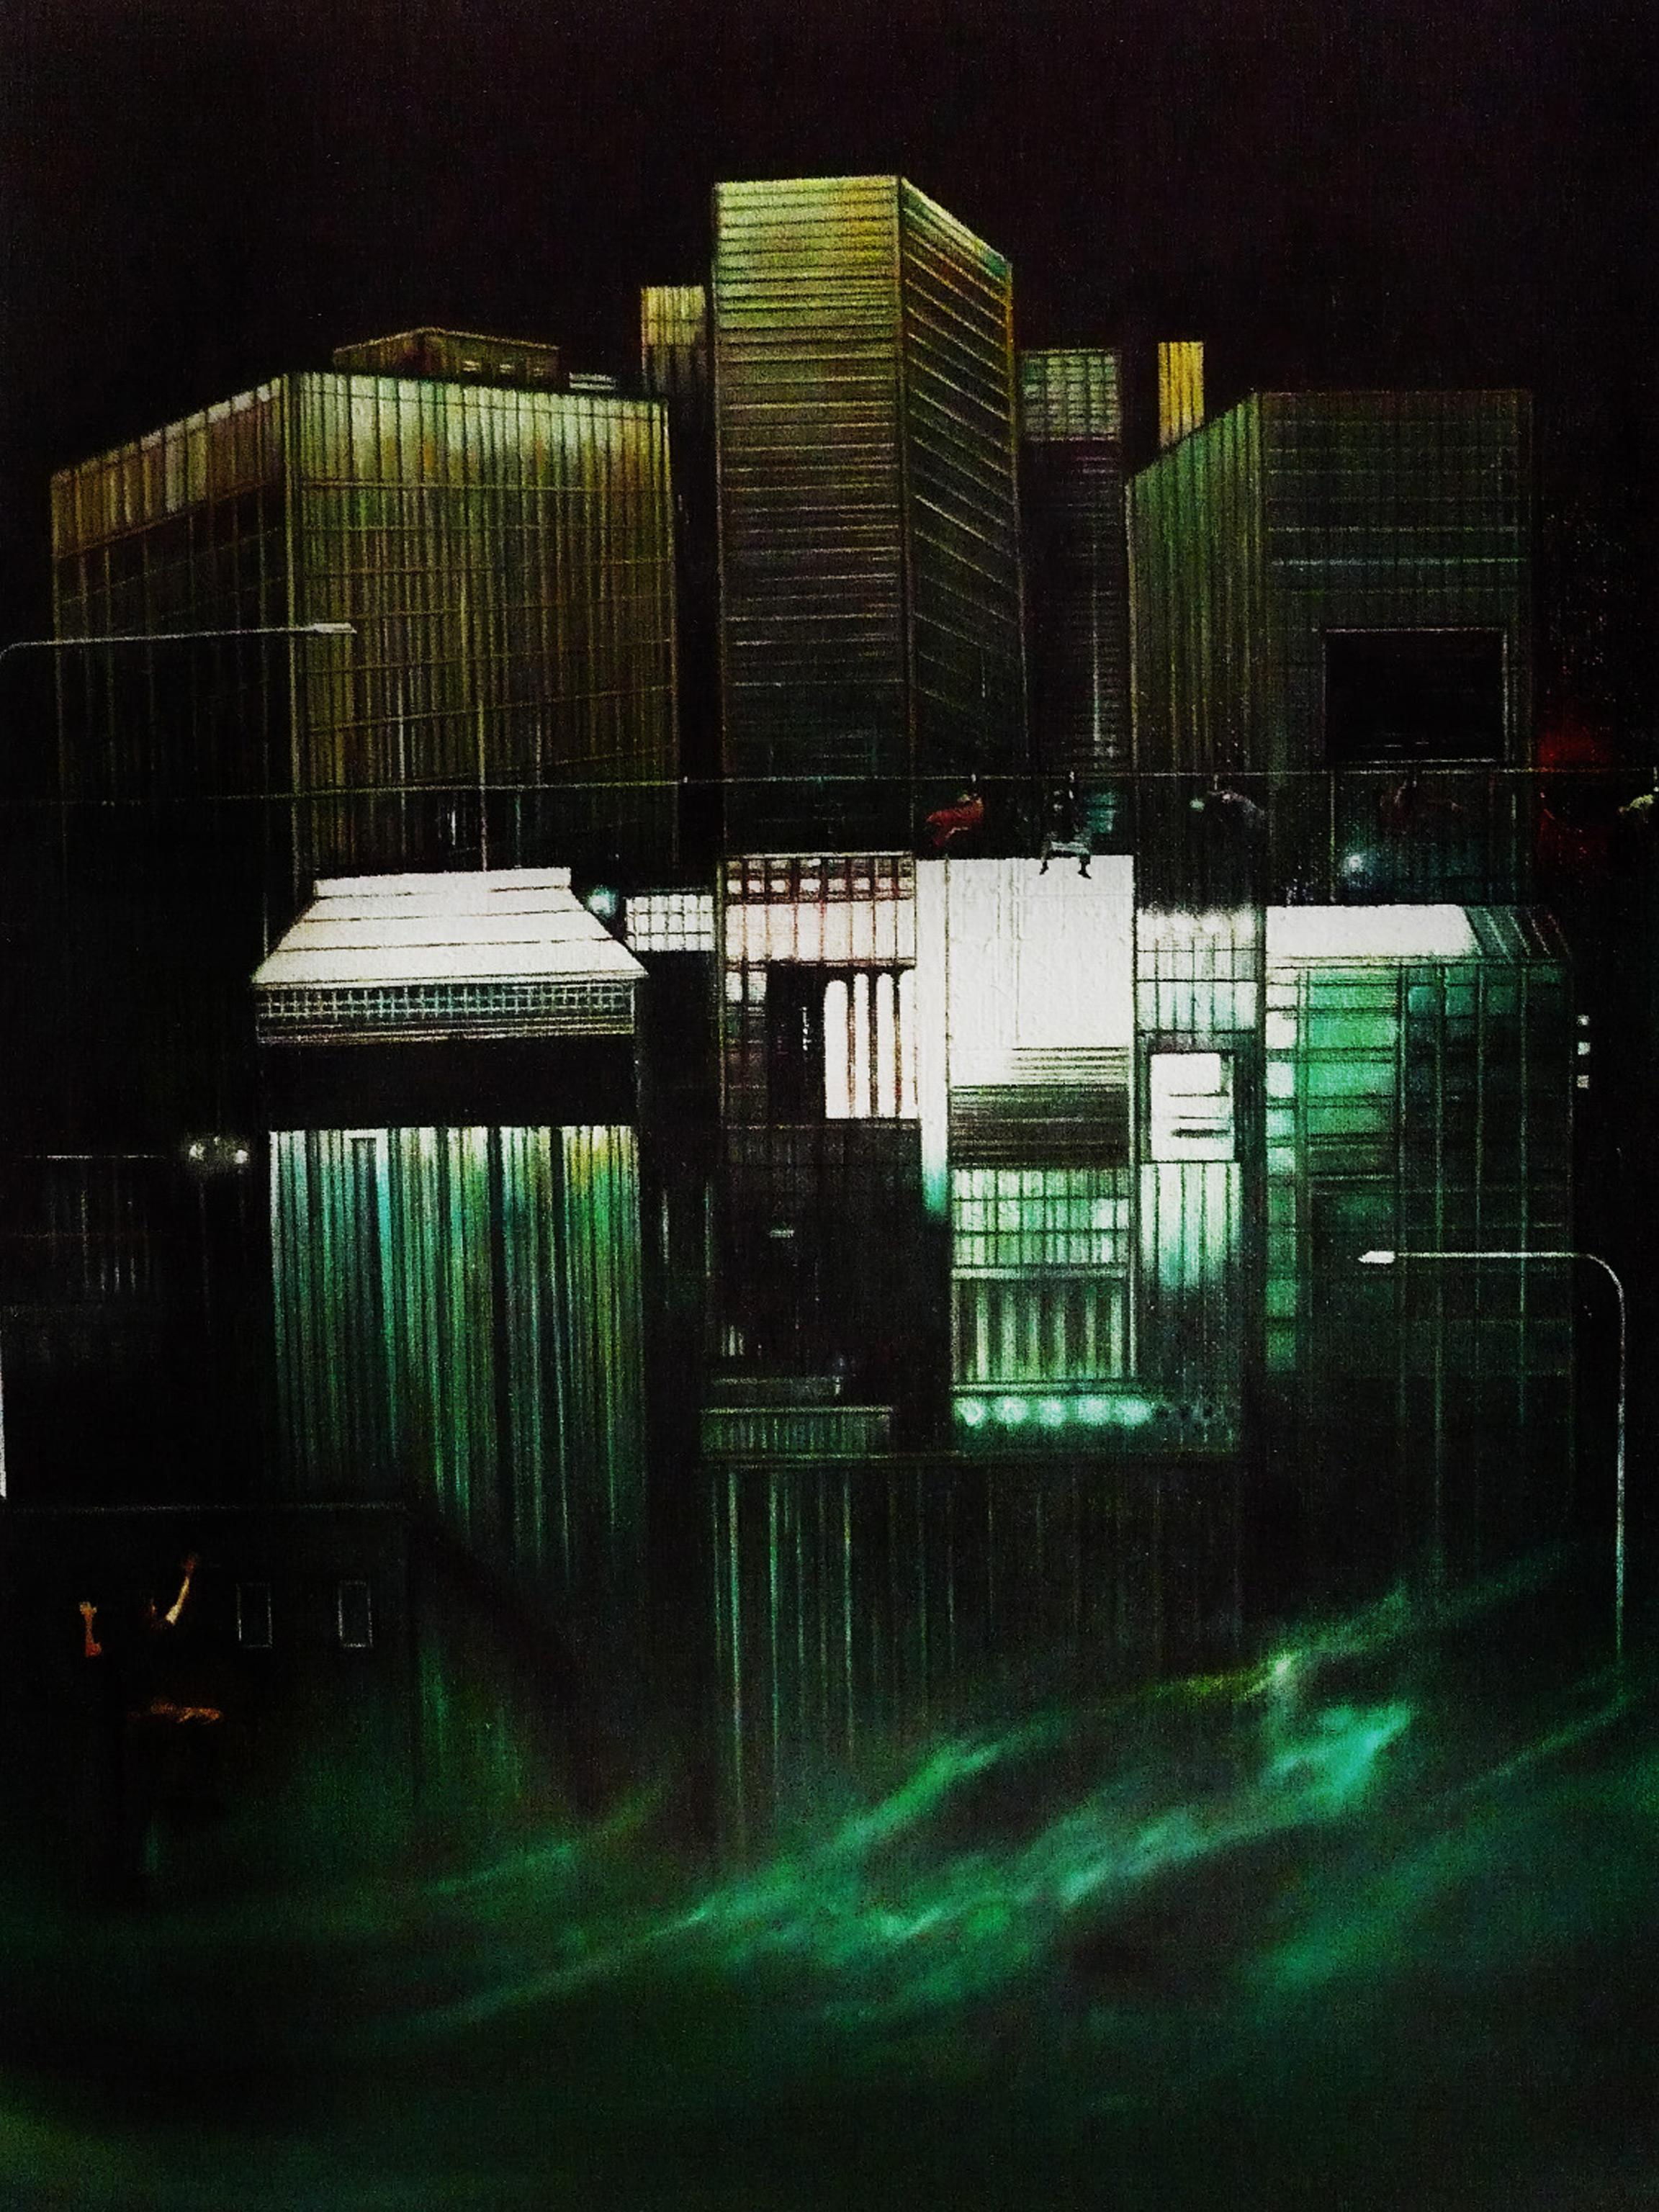 Uragani tecnica mista su tavola – cm 70×90 – 2013